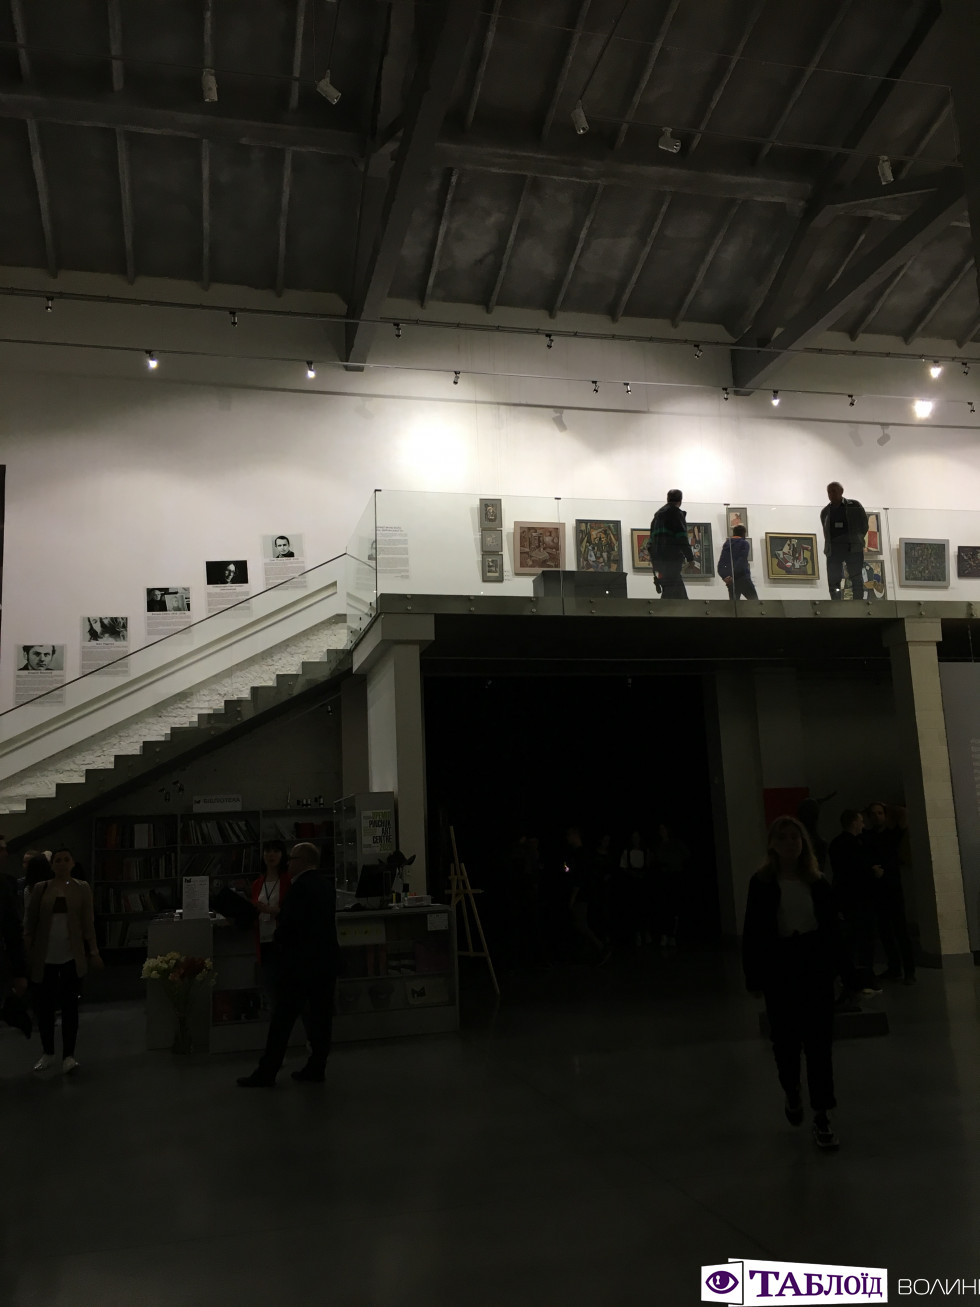 Ніч у музеї